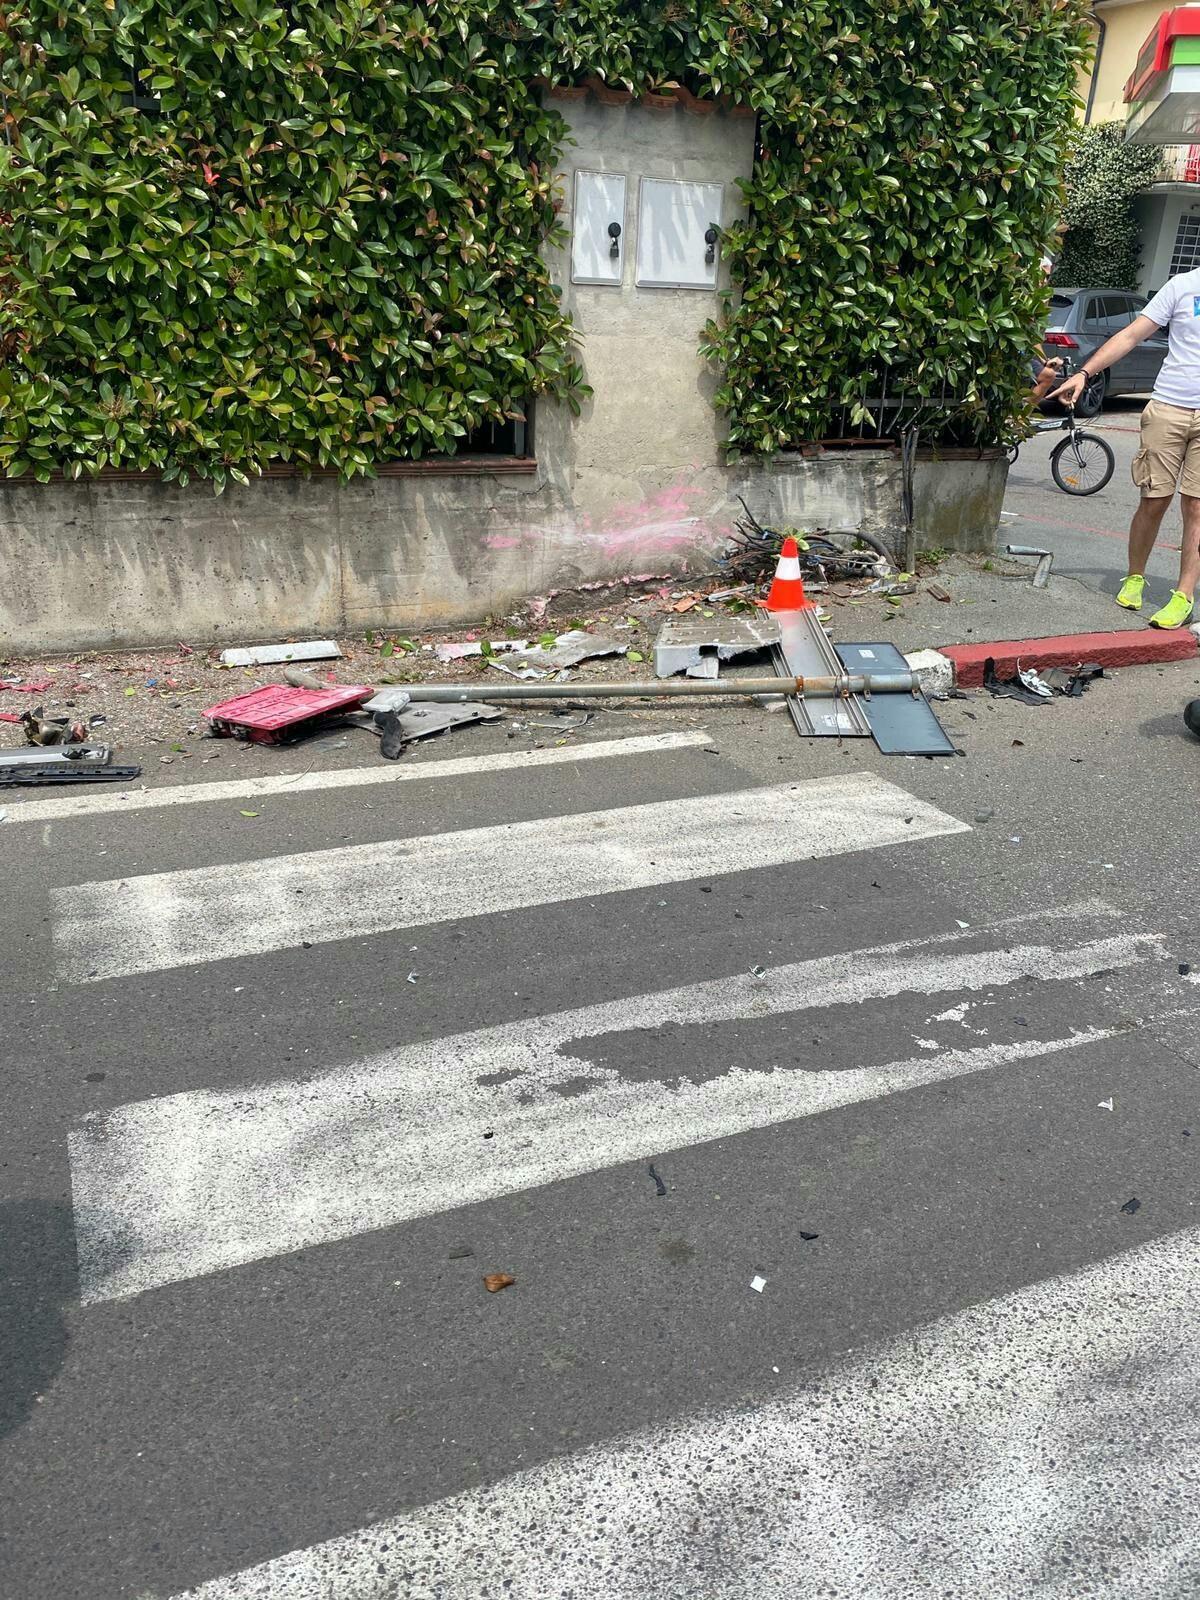 Cassetta stradale enel e pali abbattuti  a Rescaldina